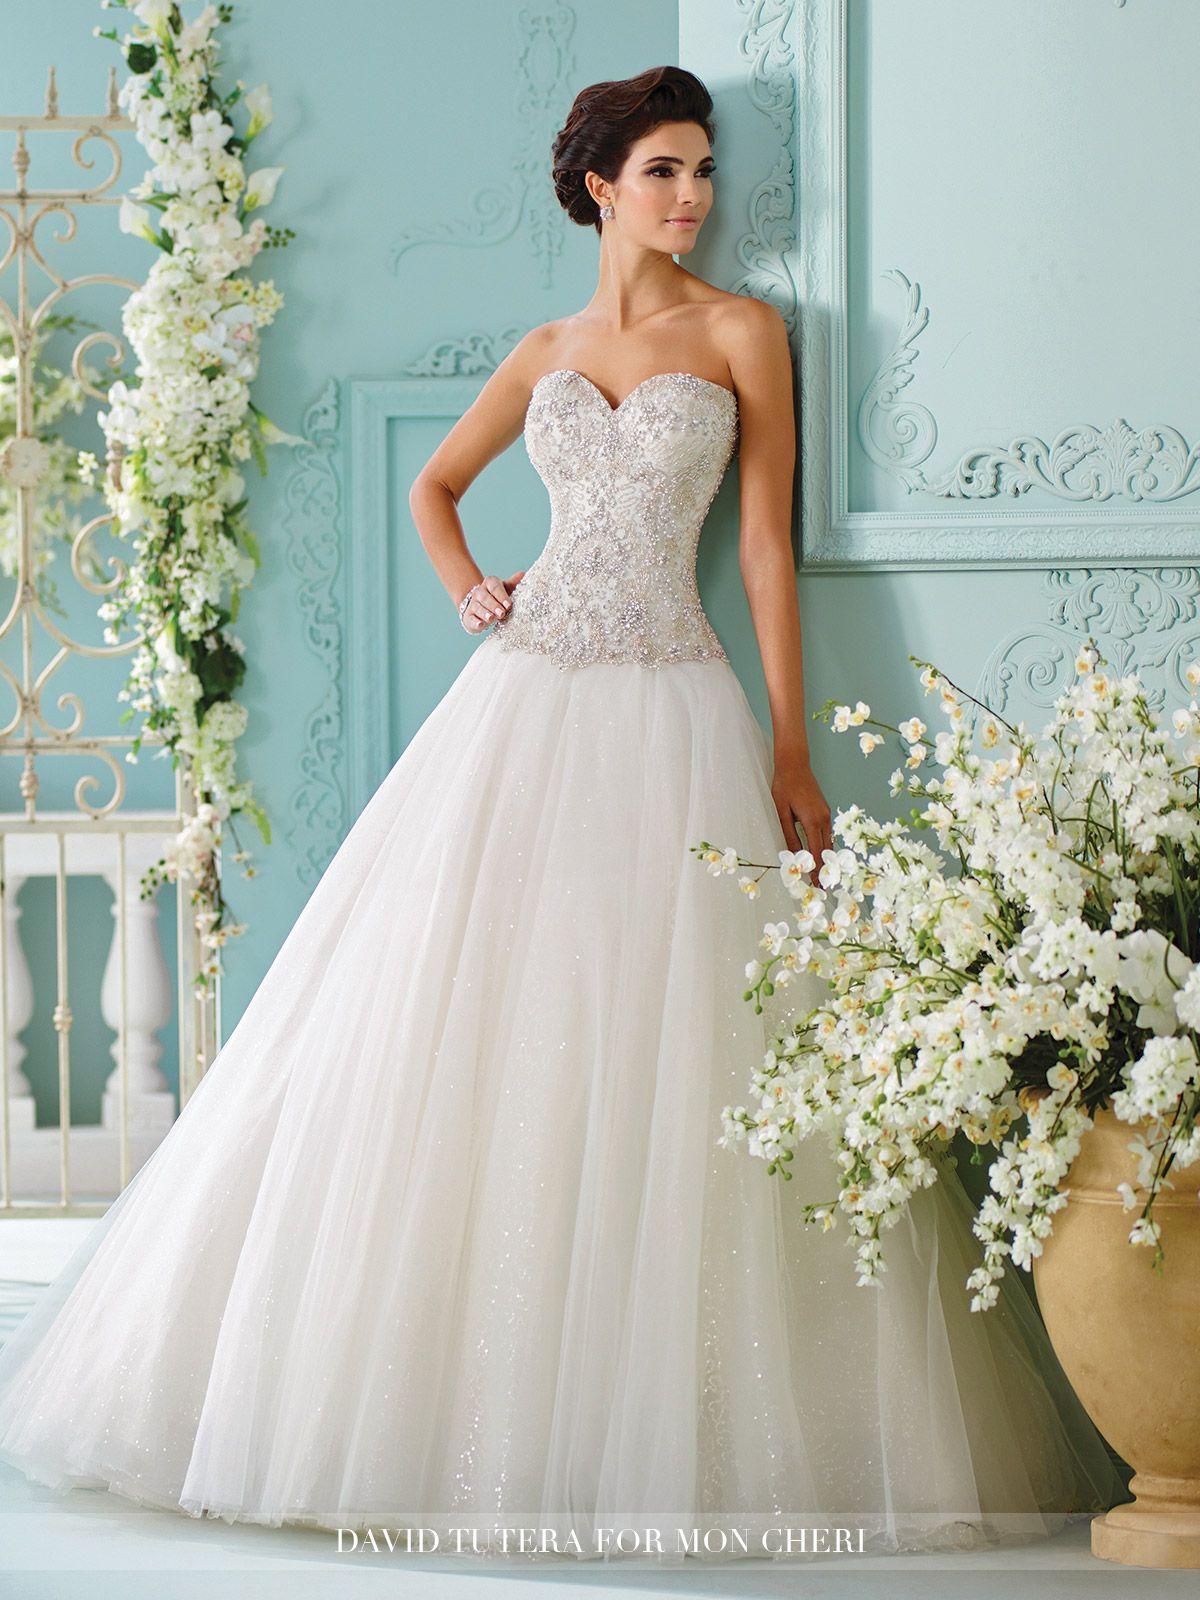 Strapless tulle with swarovski crystals wedding dress saphia